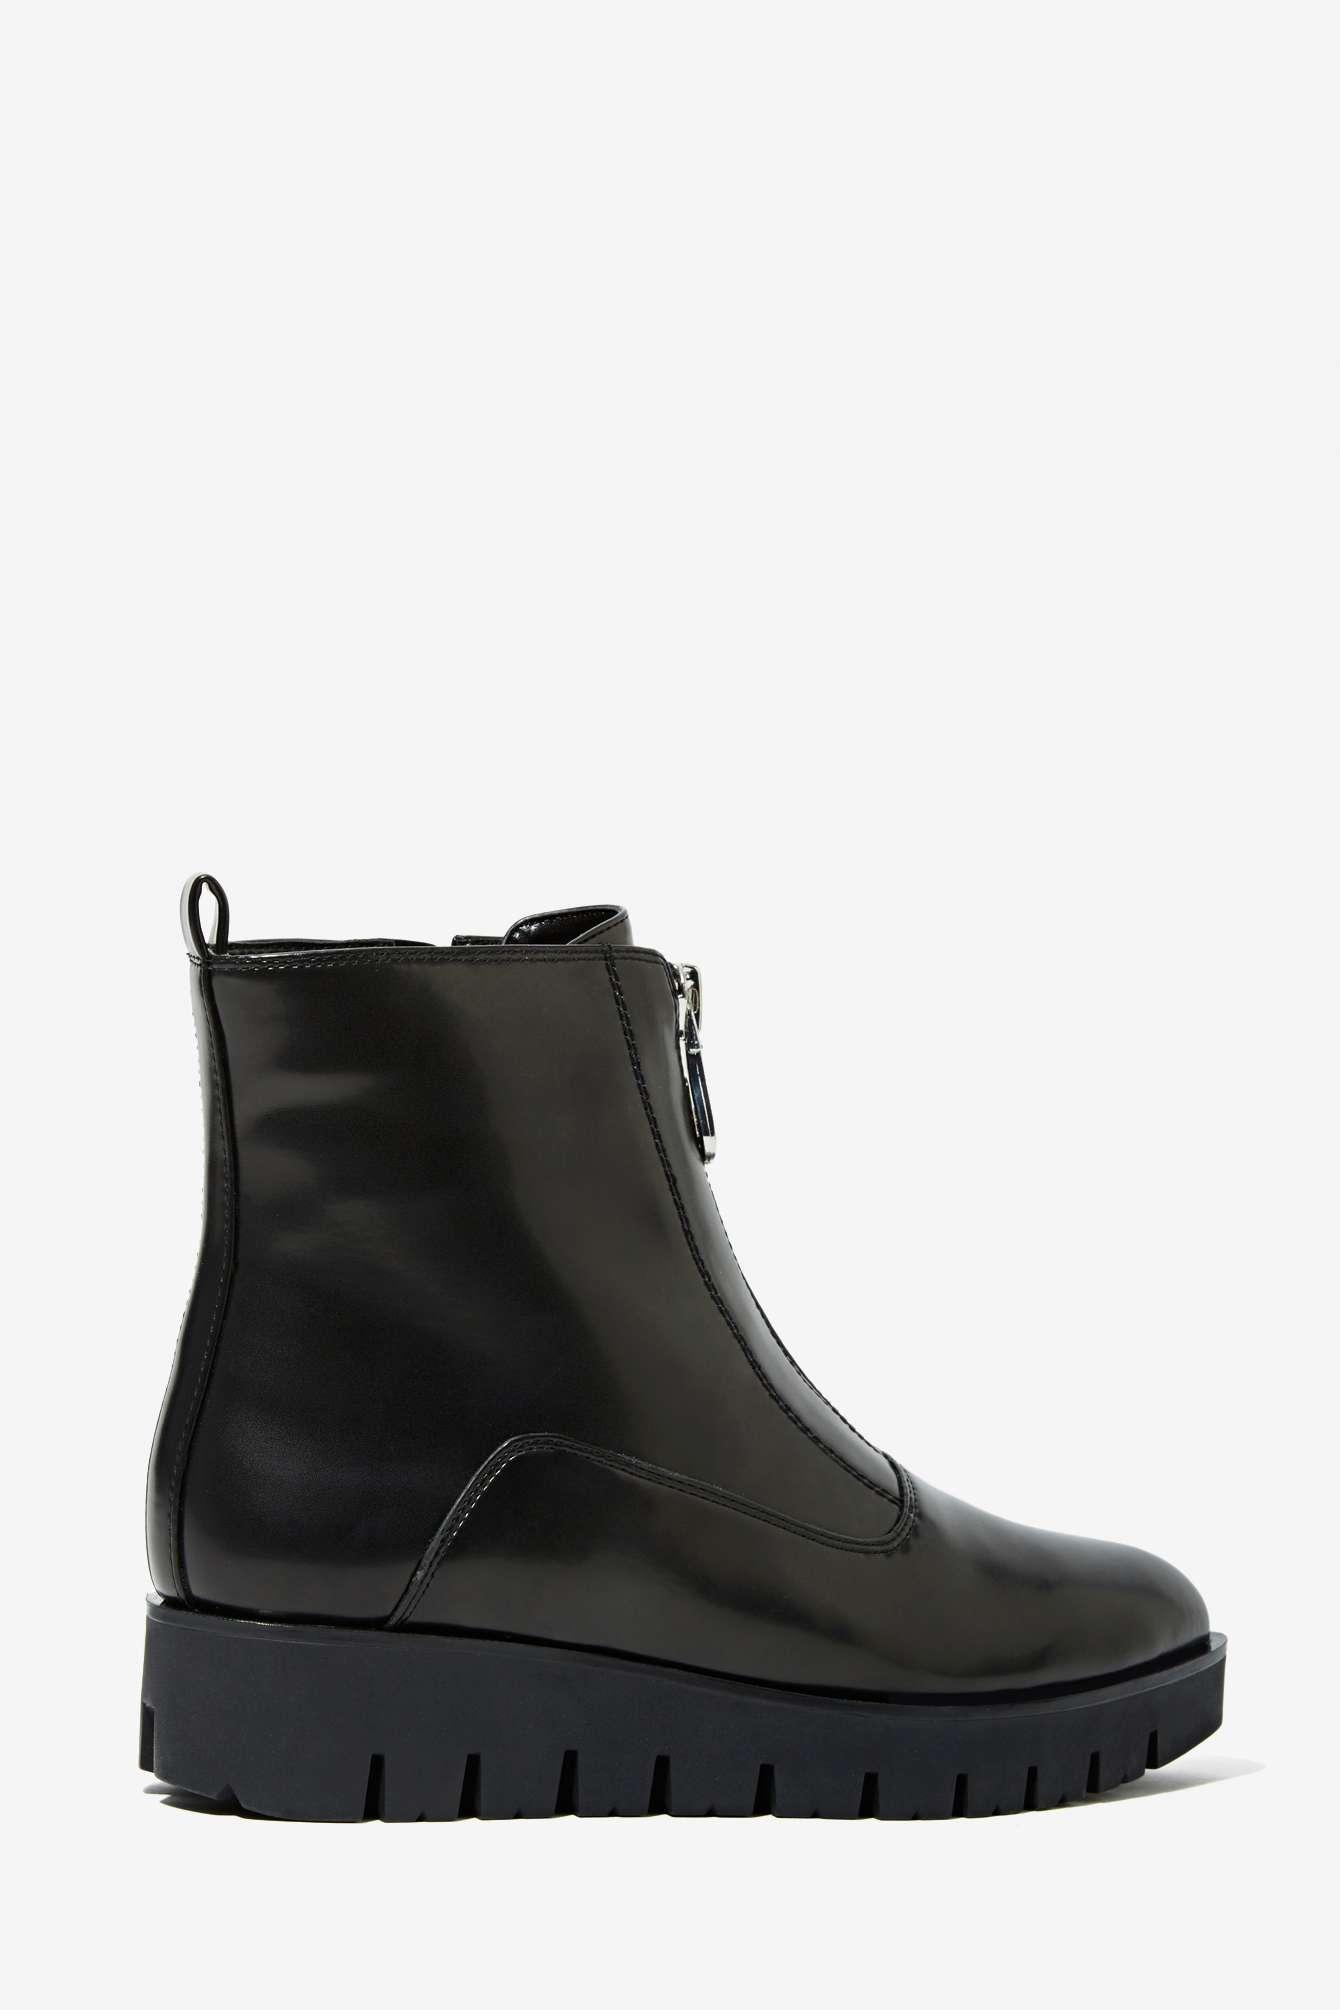 Sixty seven tabitha box leather zip boot